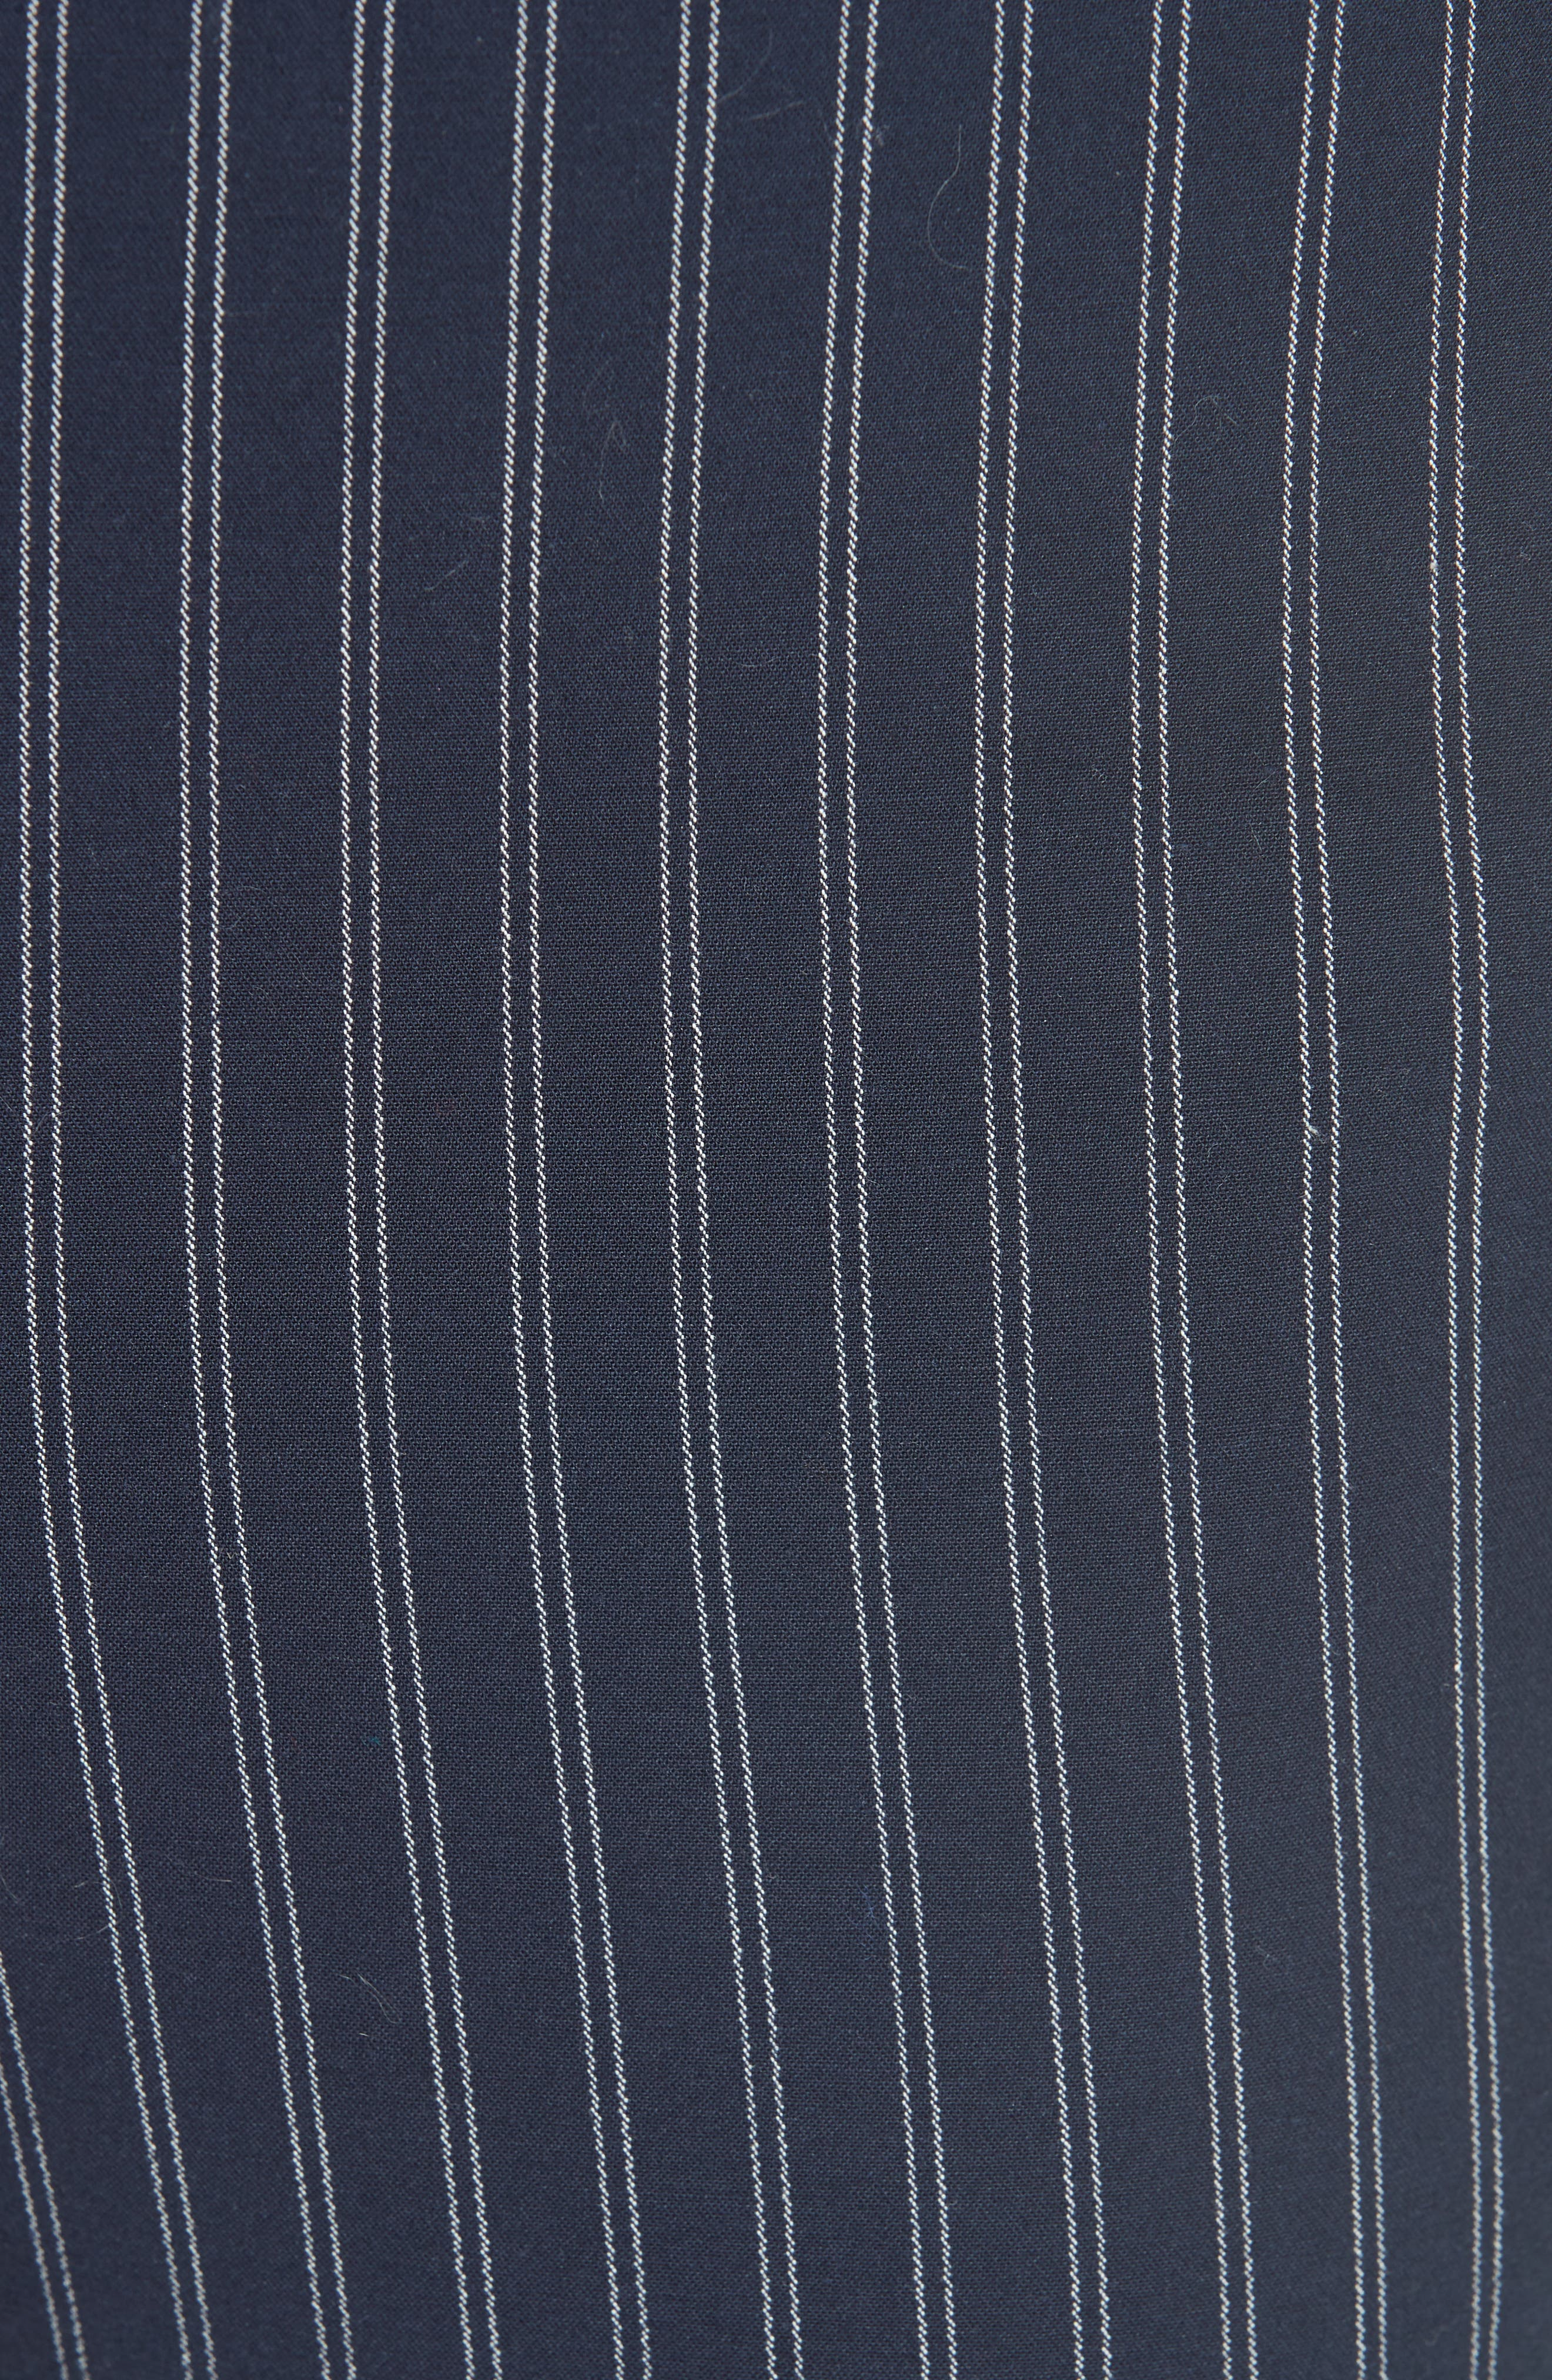 Simone Pinstripe Pants,                             Alternate thumbnail 4, color,                             Navy/ White